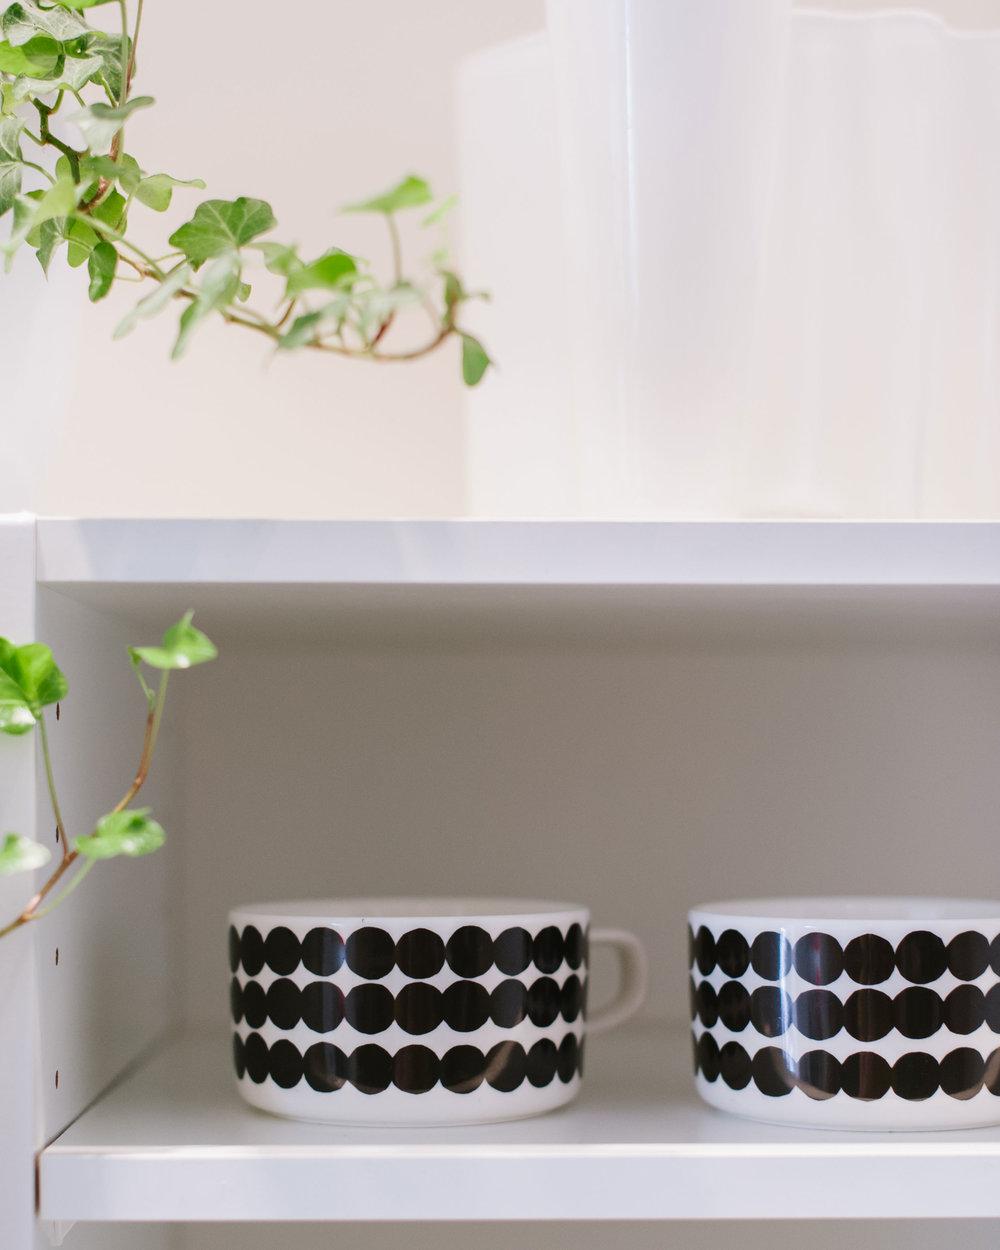 Aalto-vase-and-Marimekko-mugs-in-kitchen-cupboard.jpg